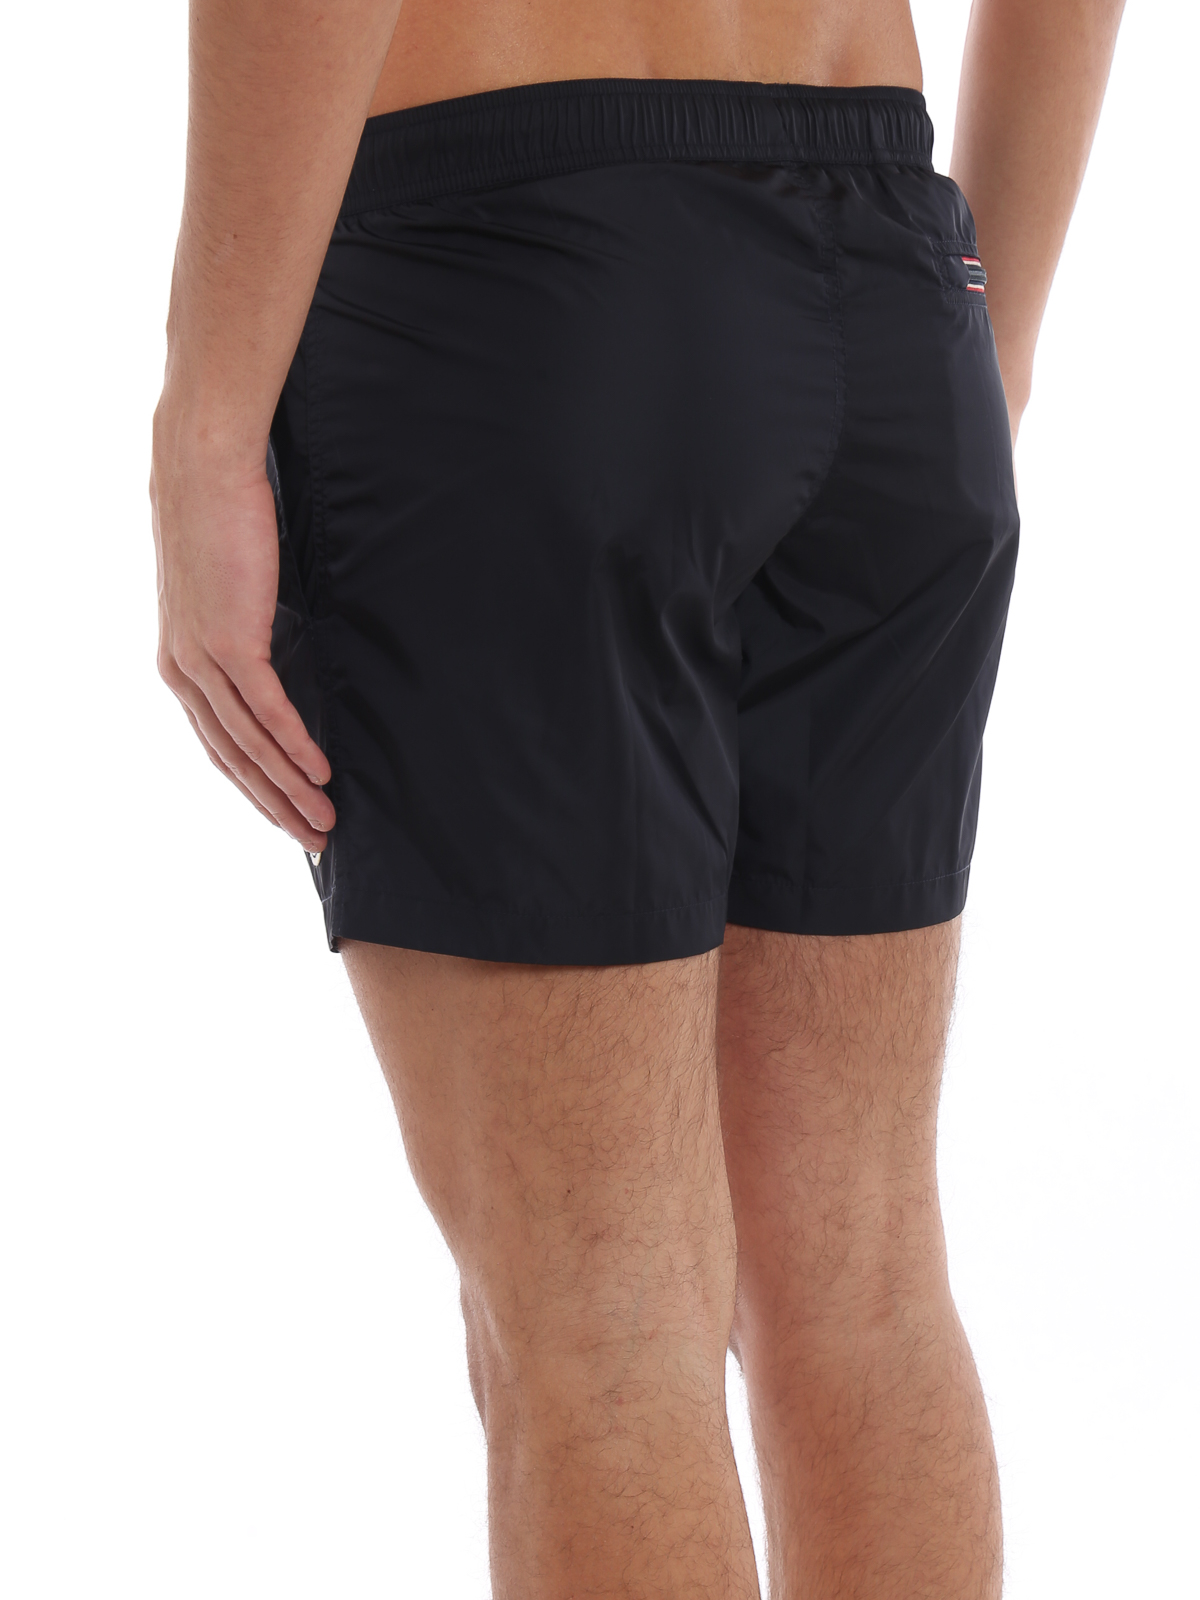 ed3d9c5691b39 Moncler - Dark blue nylon swim shorts - Swim shorts & swimming ...